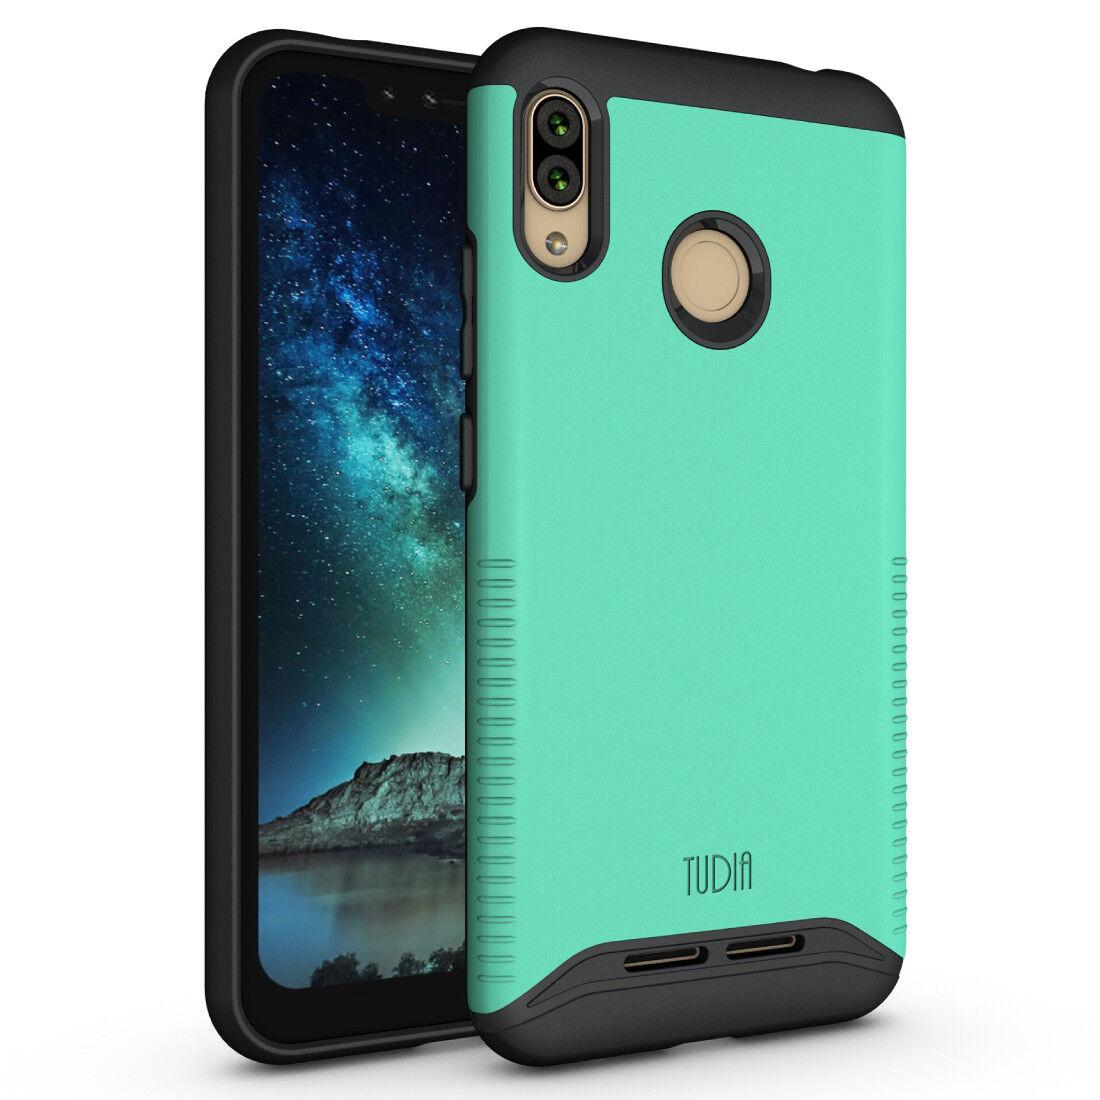 TUDIA Slim-Fit MERGE Dual Layer Protective Cover Case for BLU VIVO XL4